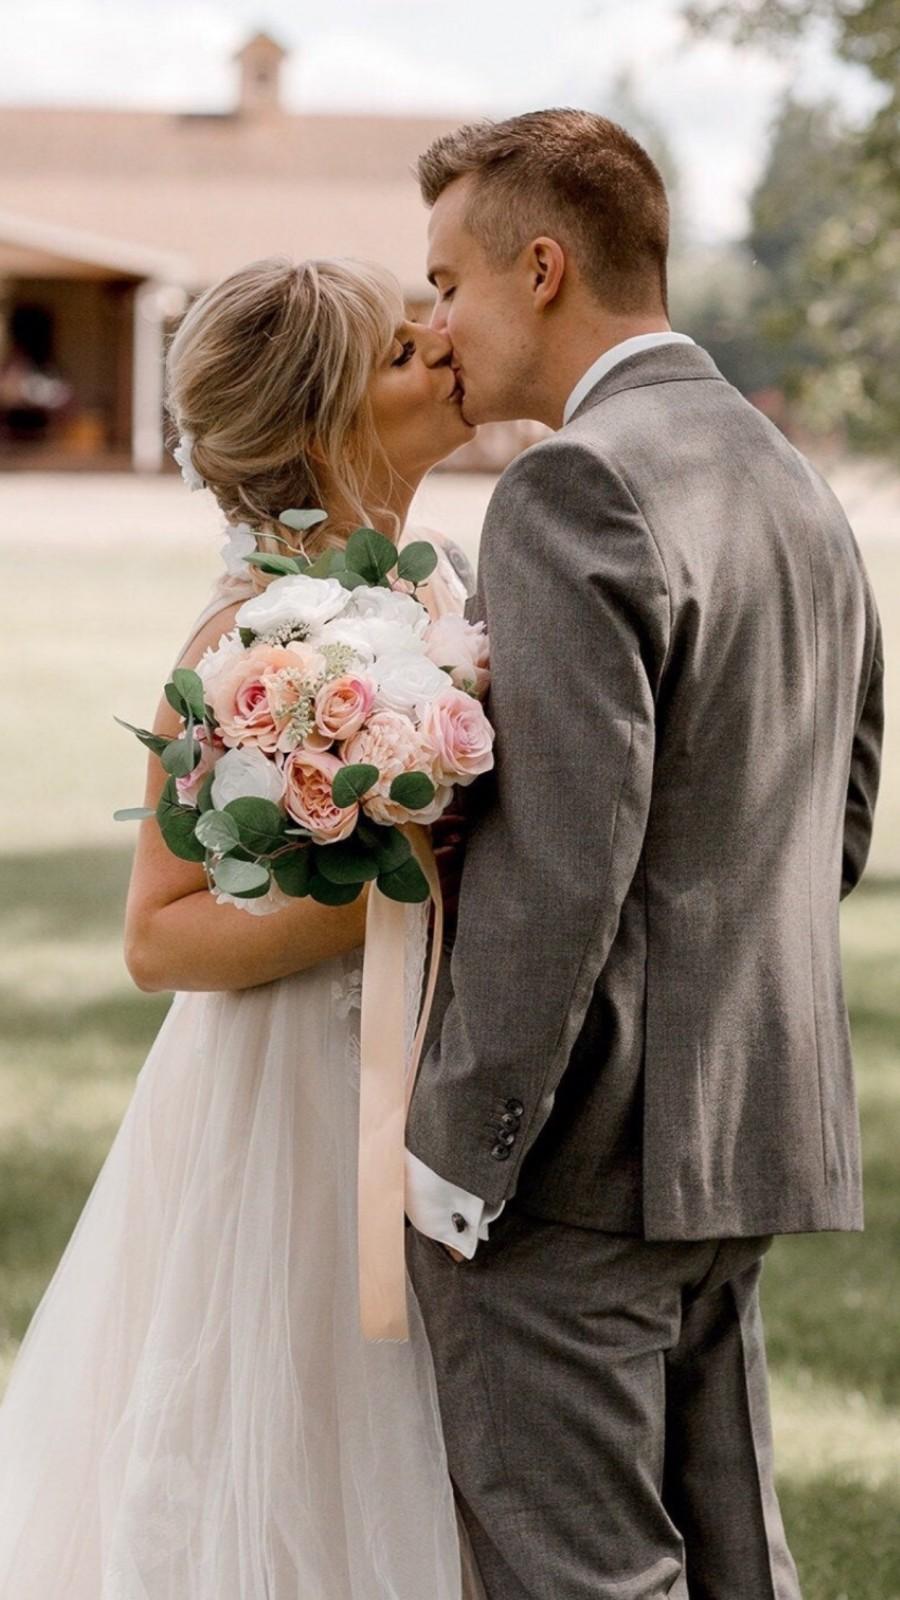 Mariage - Peach & Blush Bridal Bouquet, Wedding Bouquet Pink White silk Bouquet, Peach Bouquet, Eucalyptus, Bridesmaids, Silk Flowers, Artificial Bouq